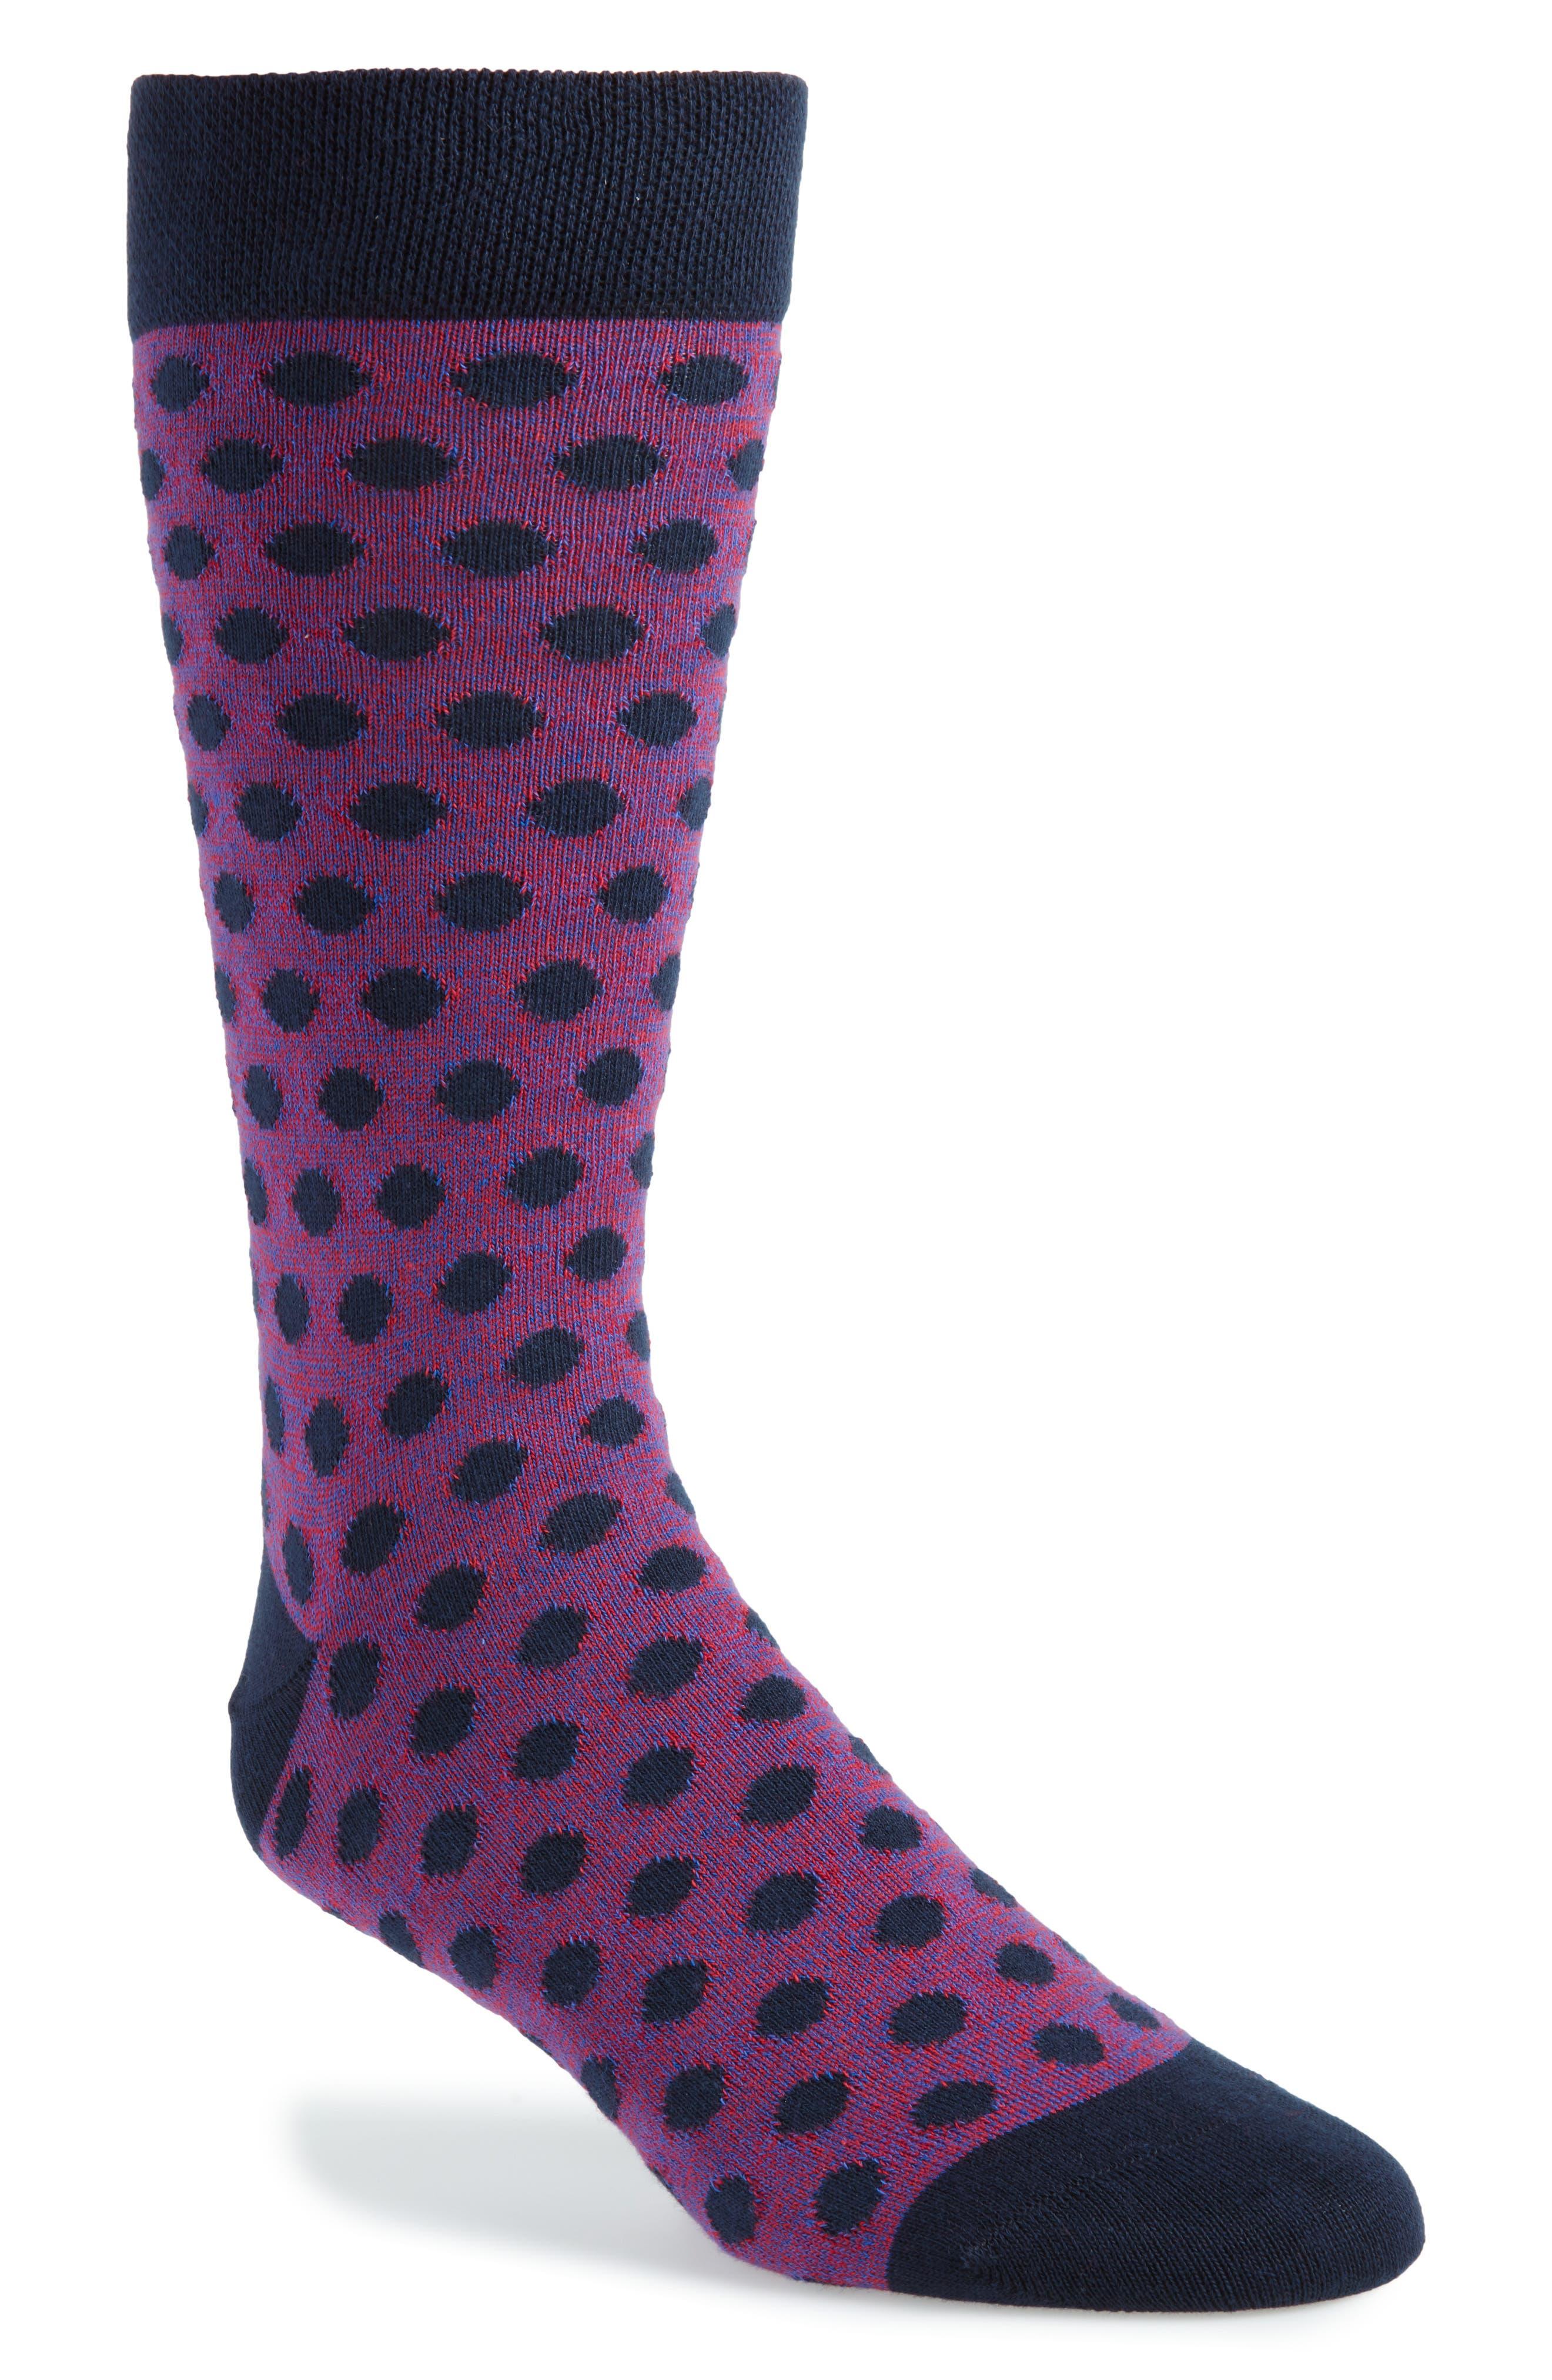 Spot Socks,                             Main thumbnail 1, color,                             NAVY